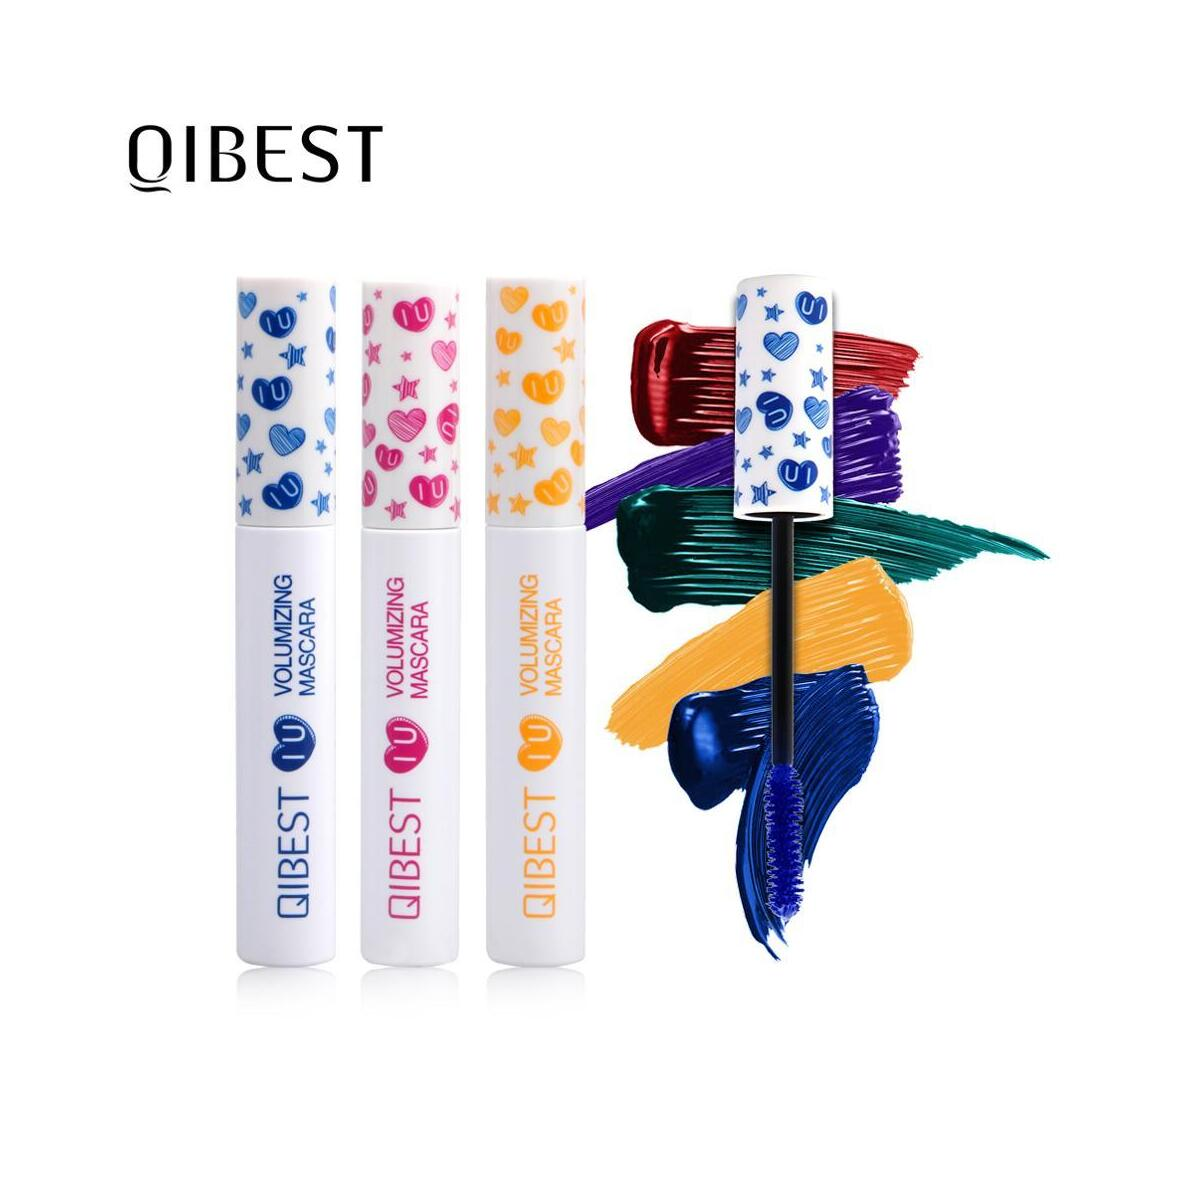 QIBEST Colorful Mascara, 6